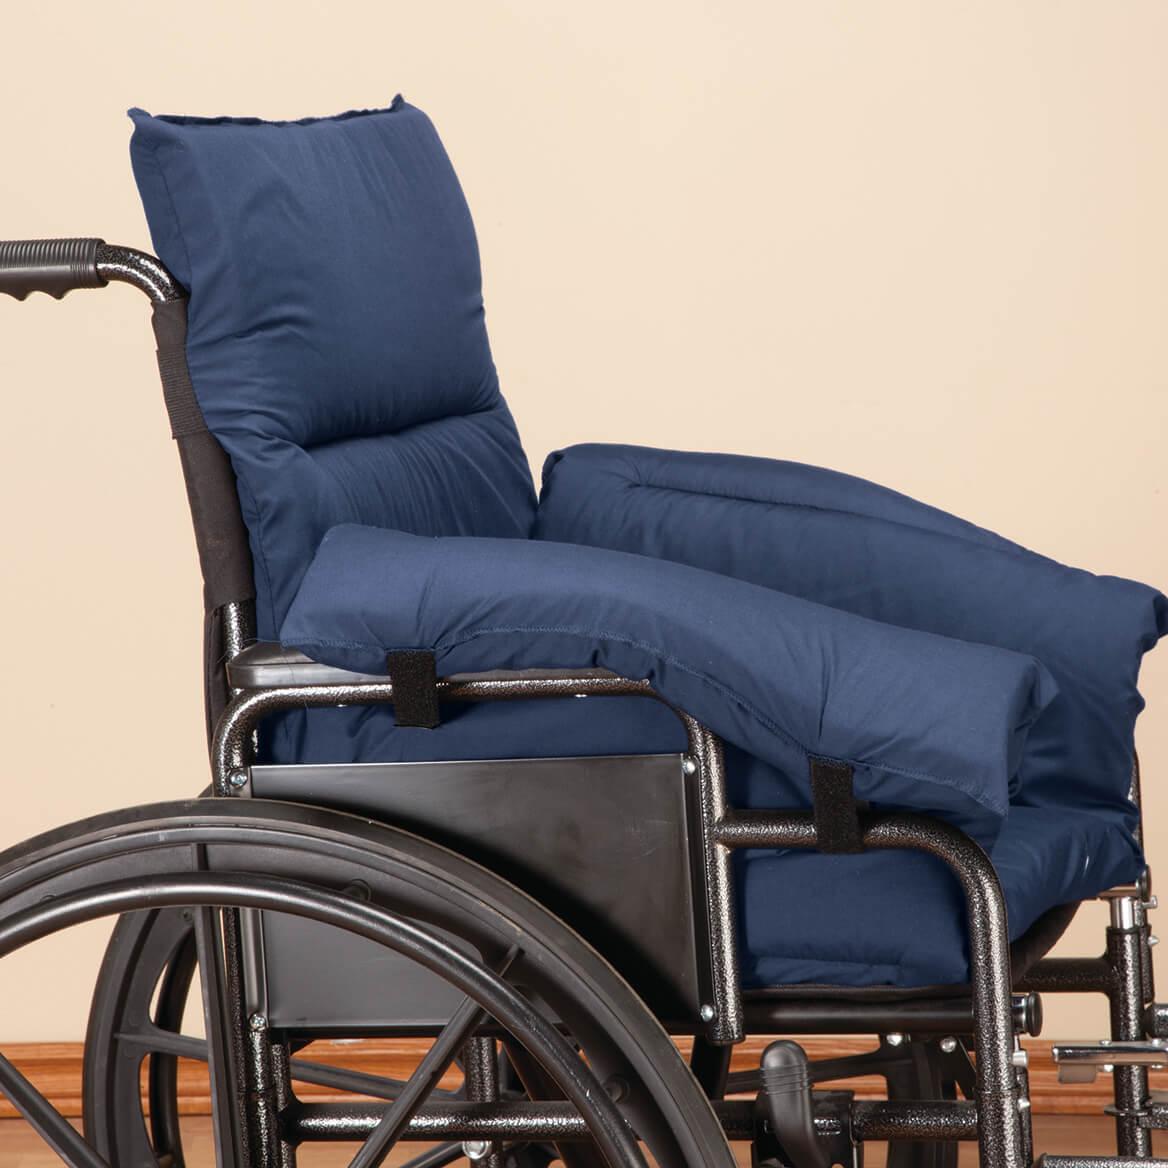 Pressure Reducing Cushion for Wheelchairs-359267